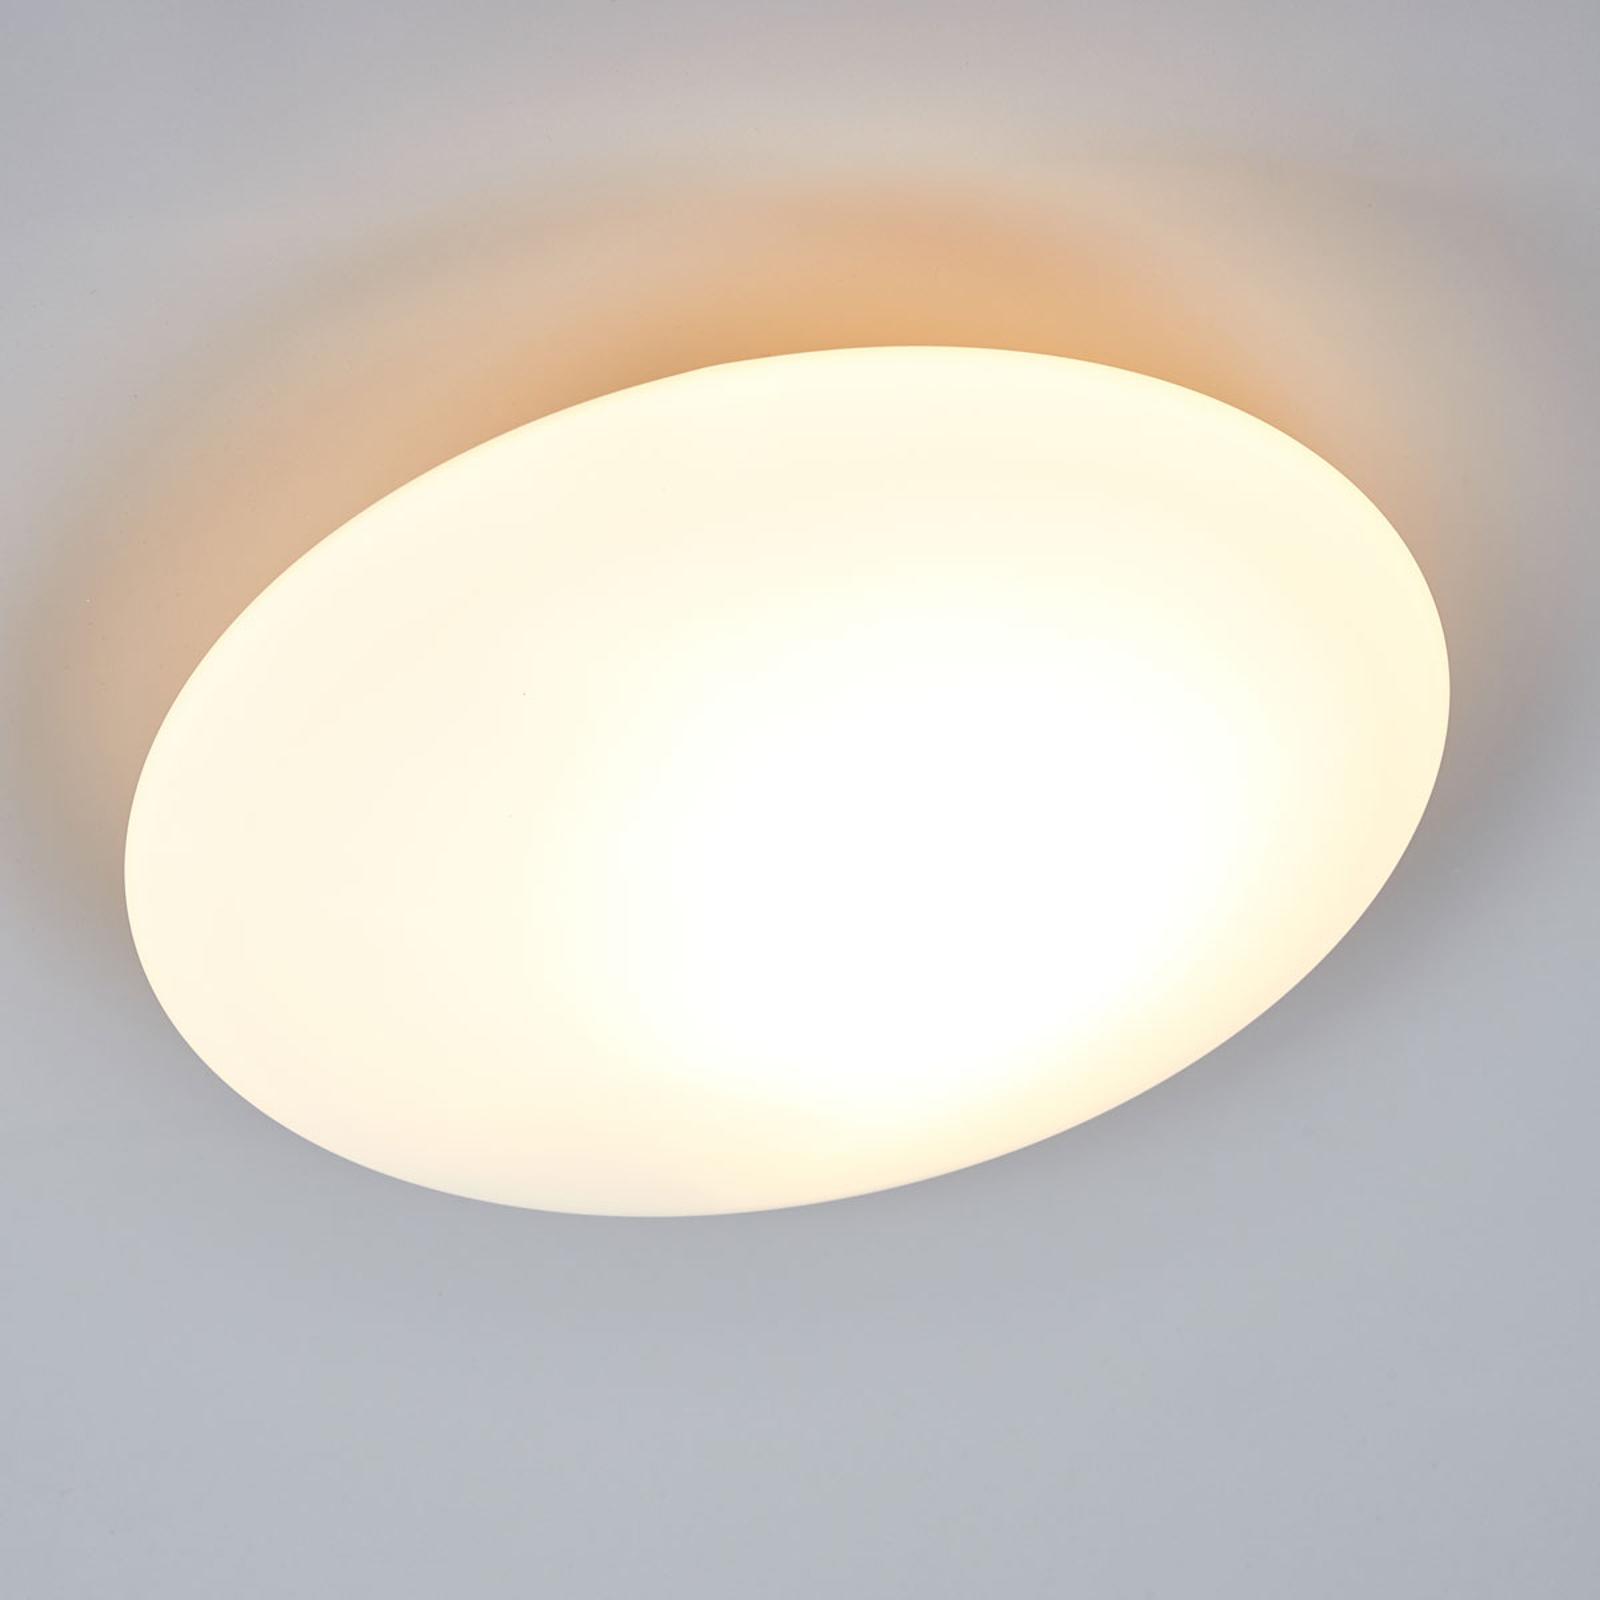 Szklana lampa sufitowa OPAL 30 cm